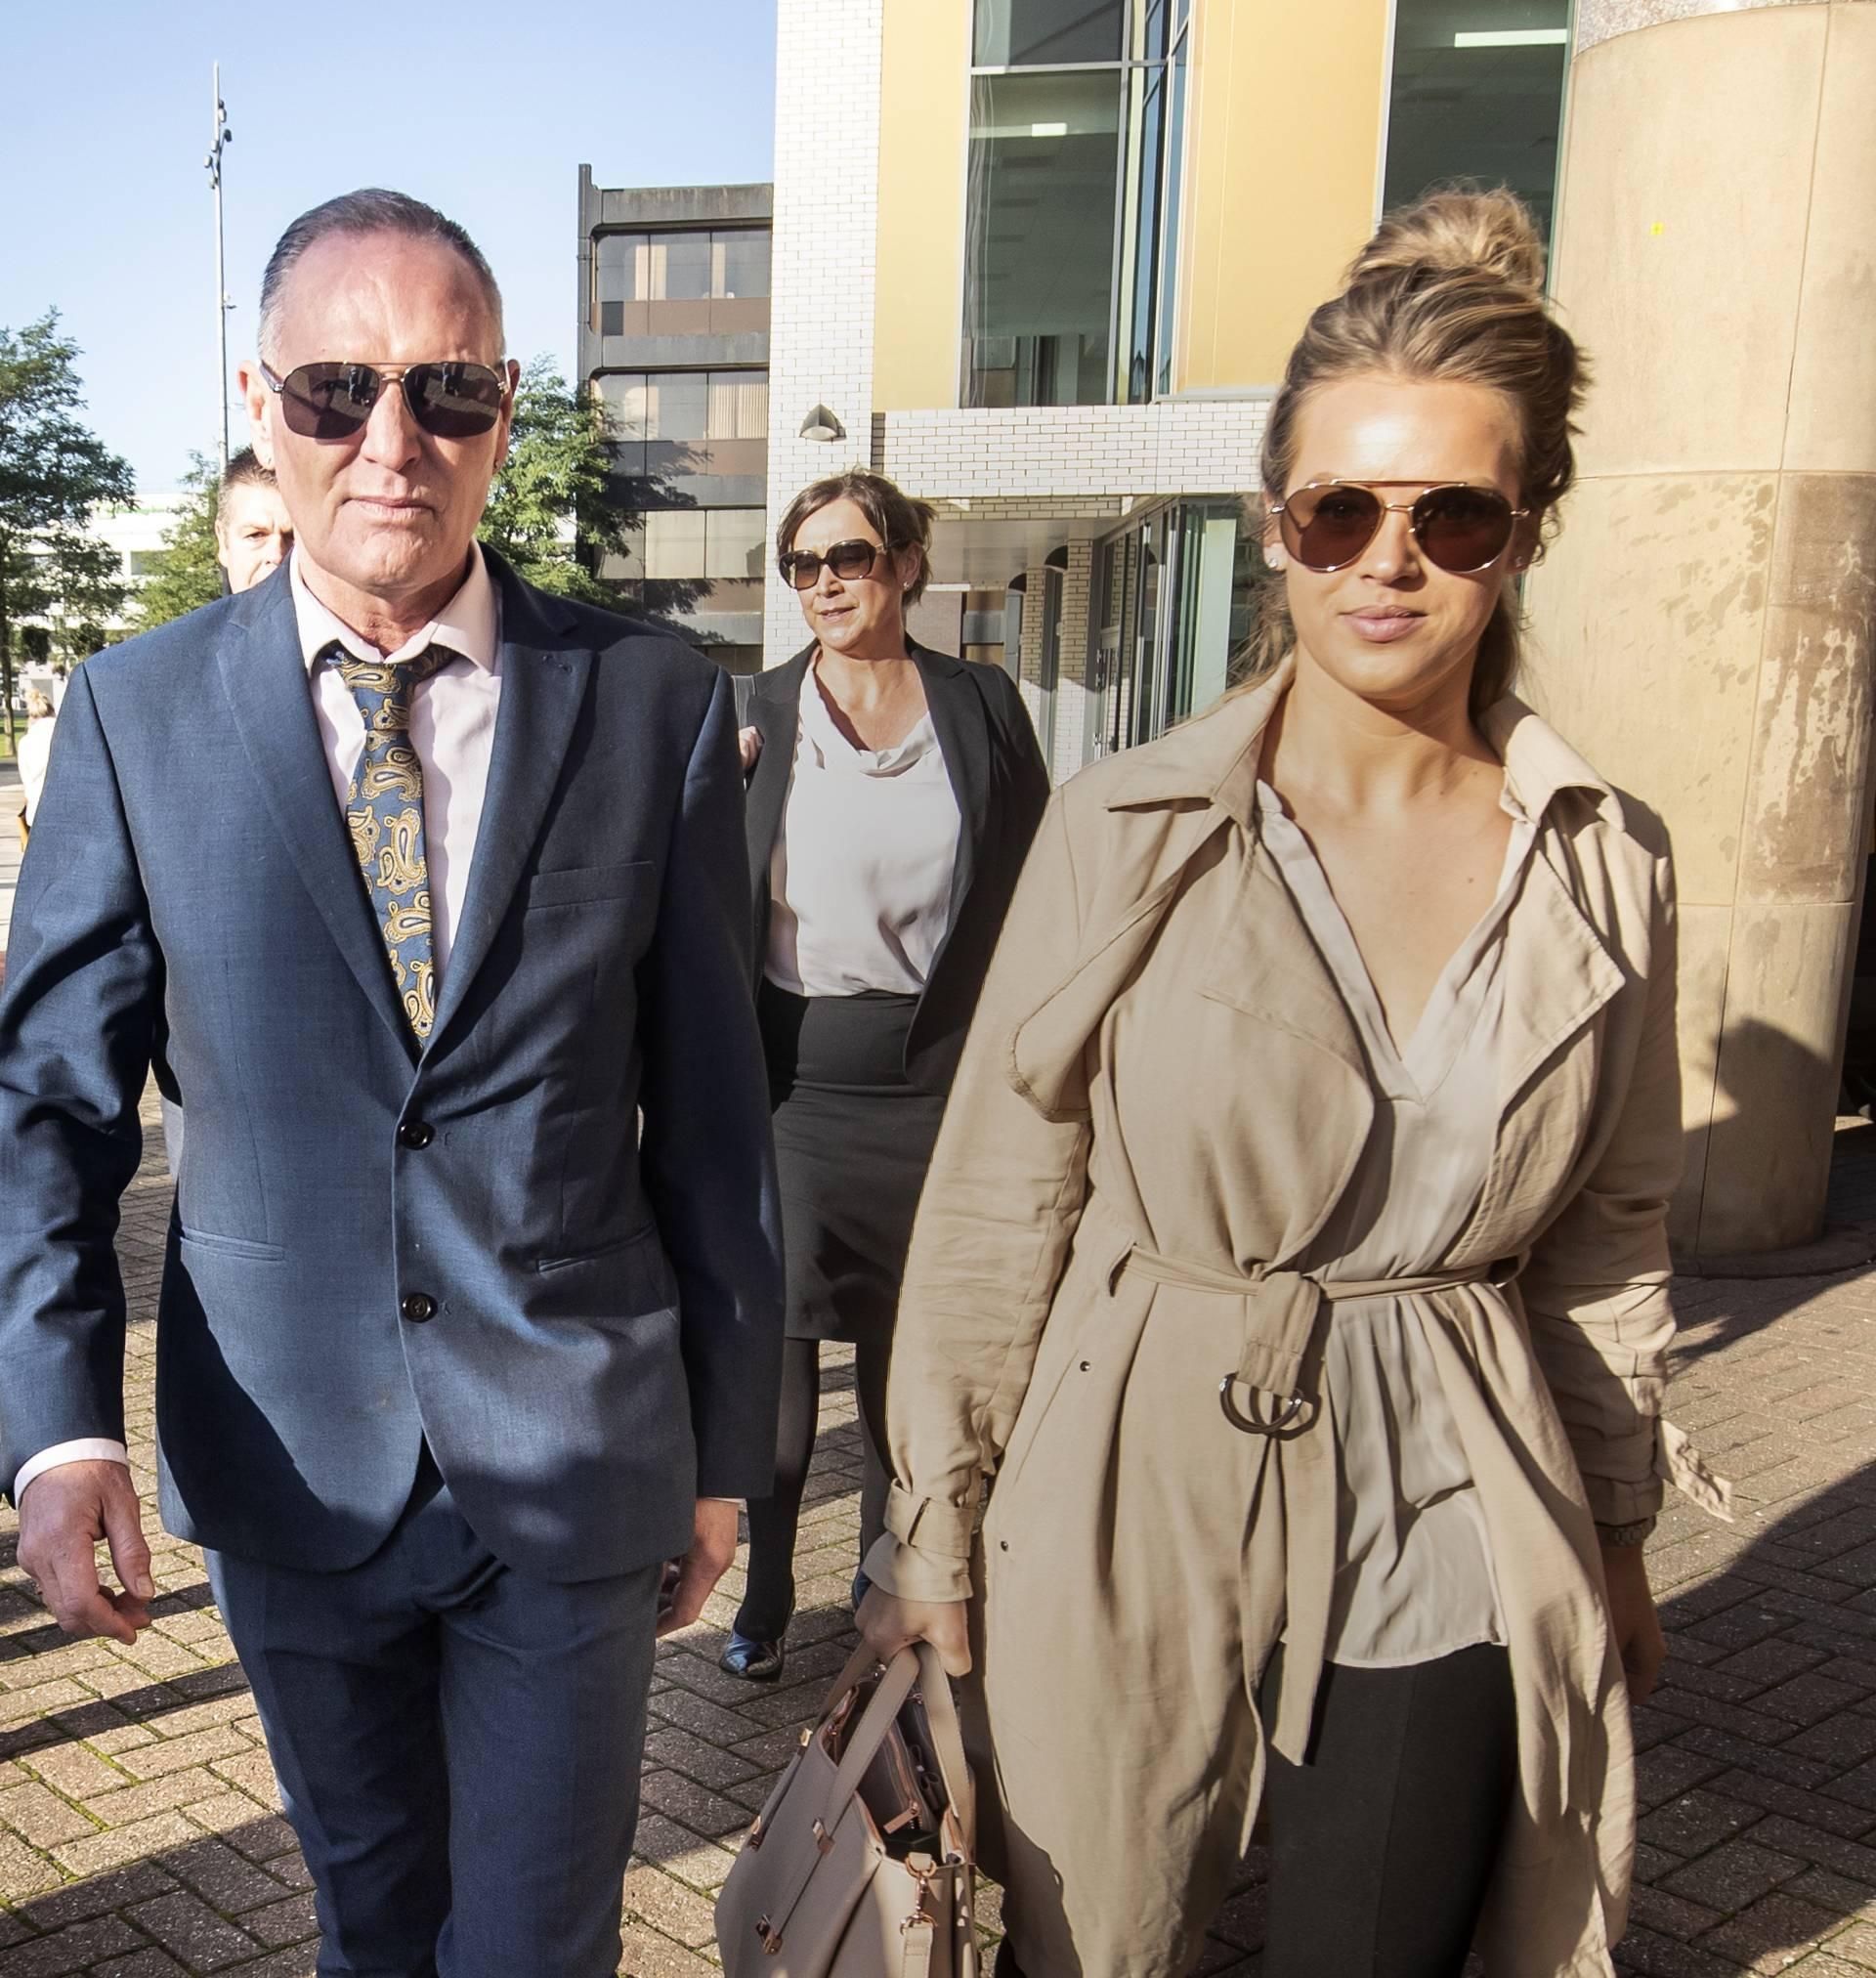 Paul Gascoigne court case